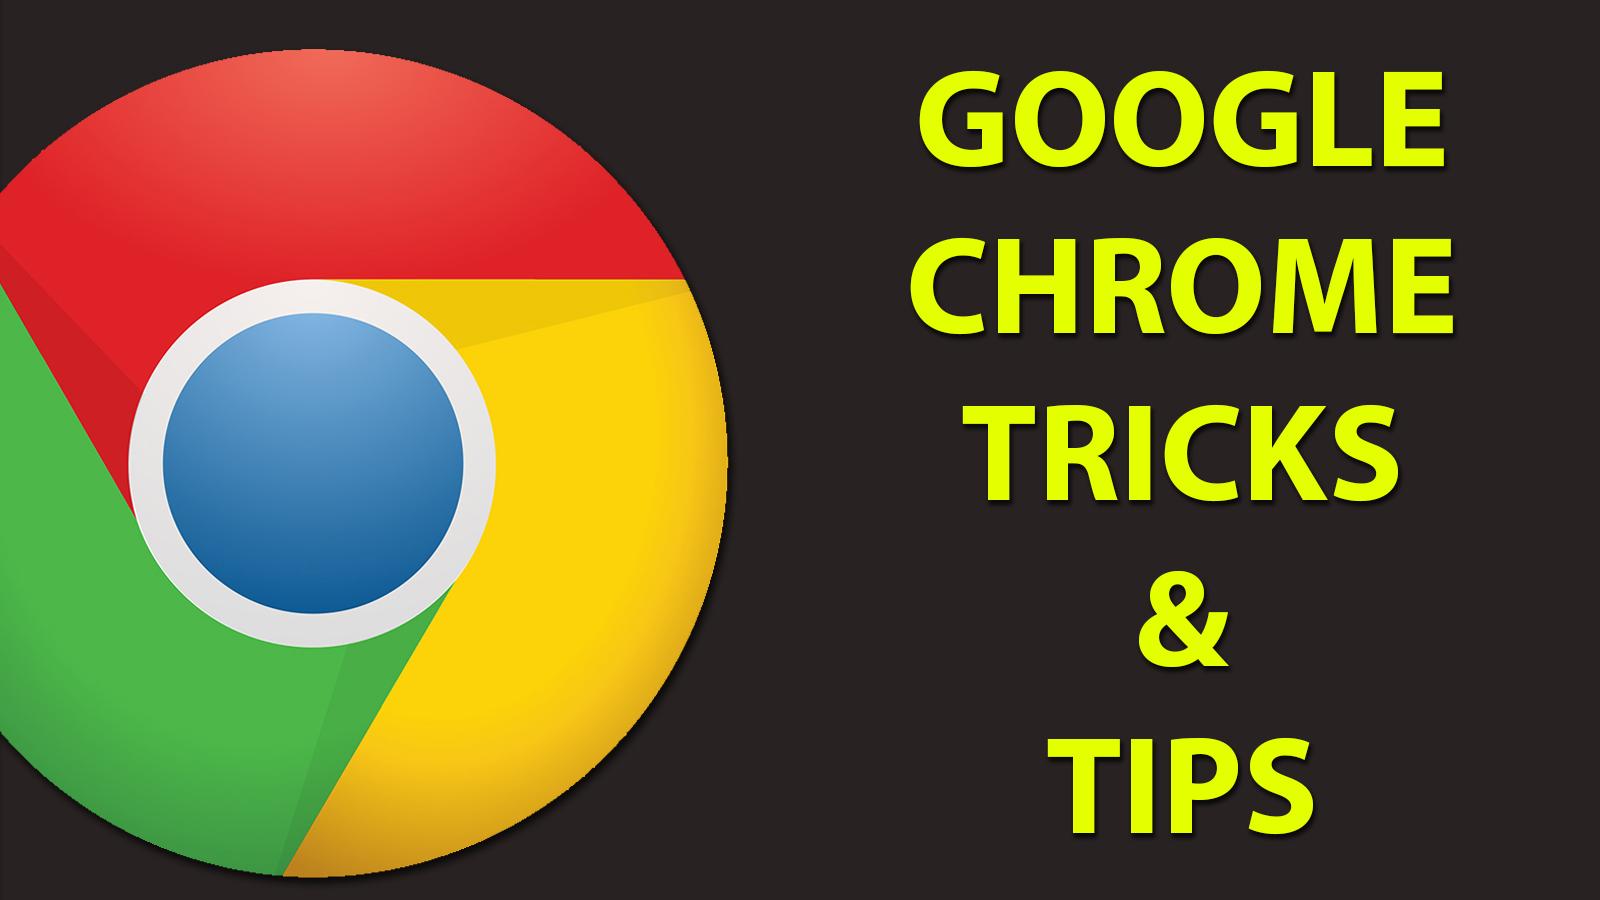 45 Best Google Chrome Tricks and Tips 2016 / 2017